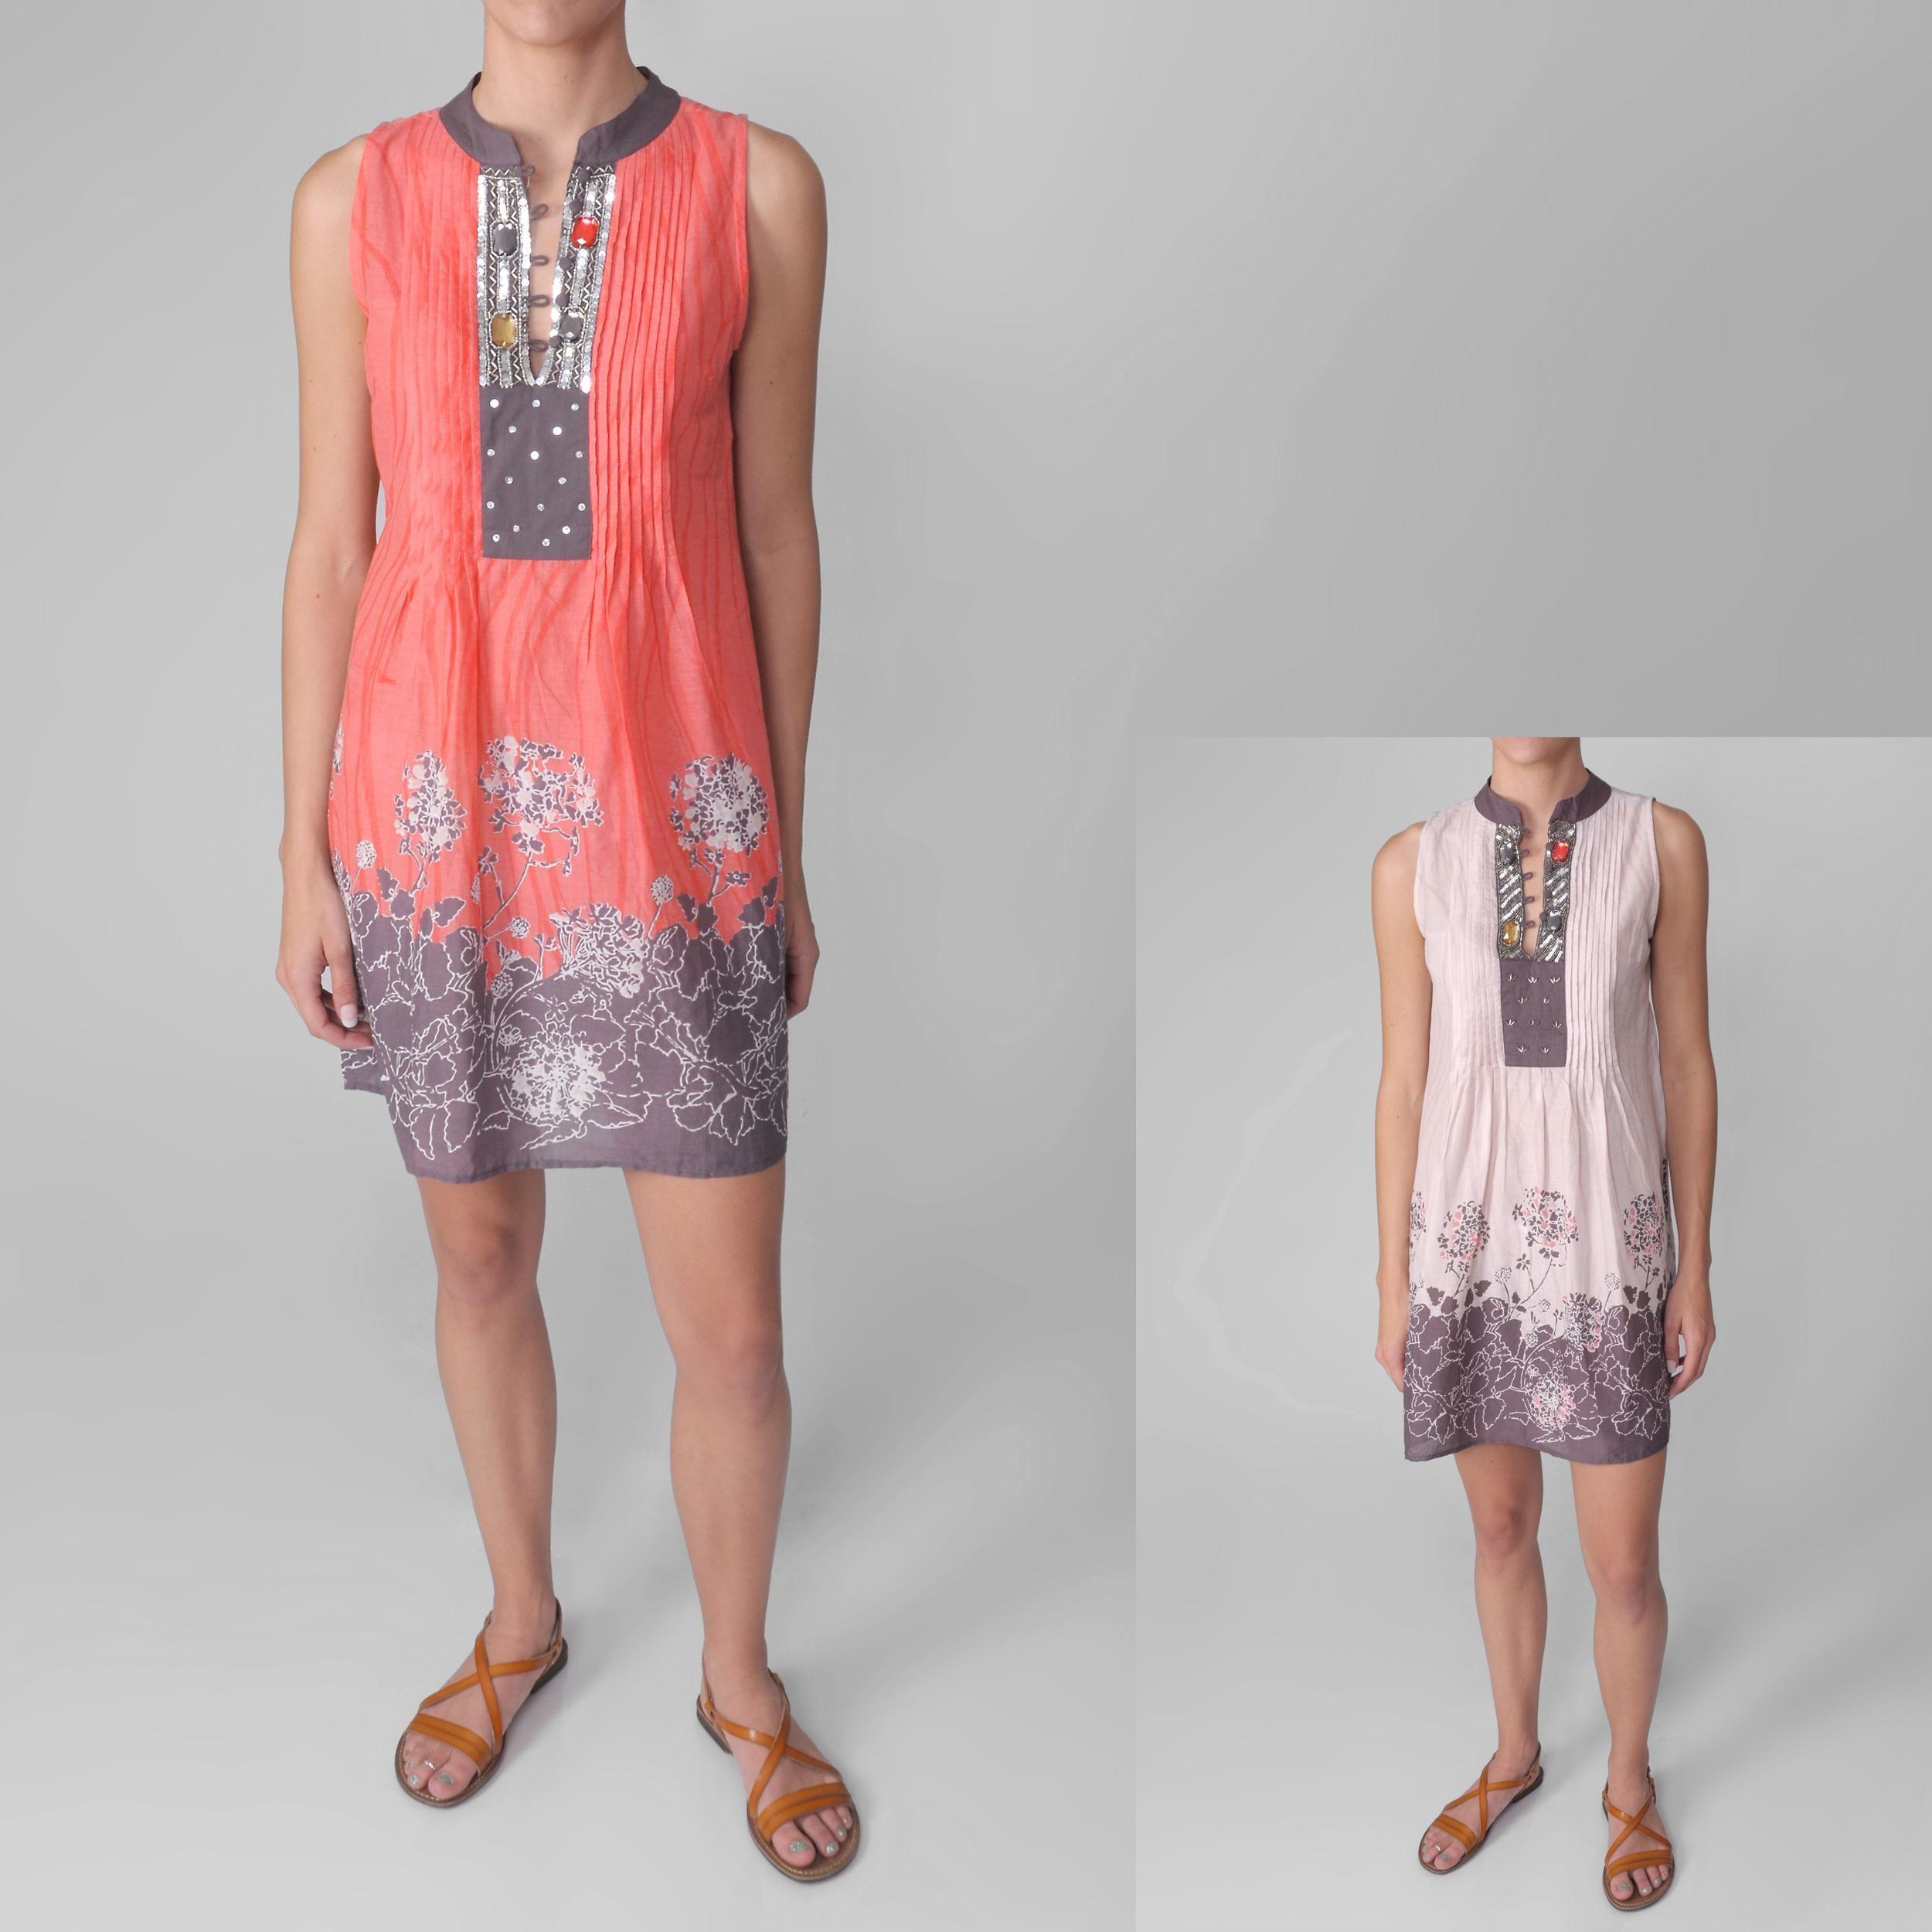 Journee Collection Junior's Jeweled Sleeveless Tunic Dress